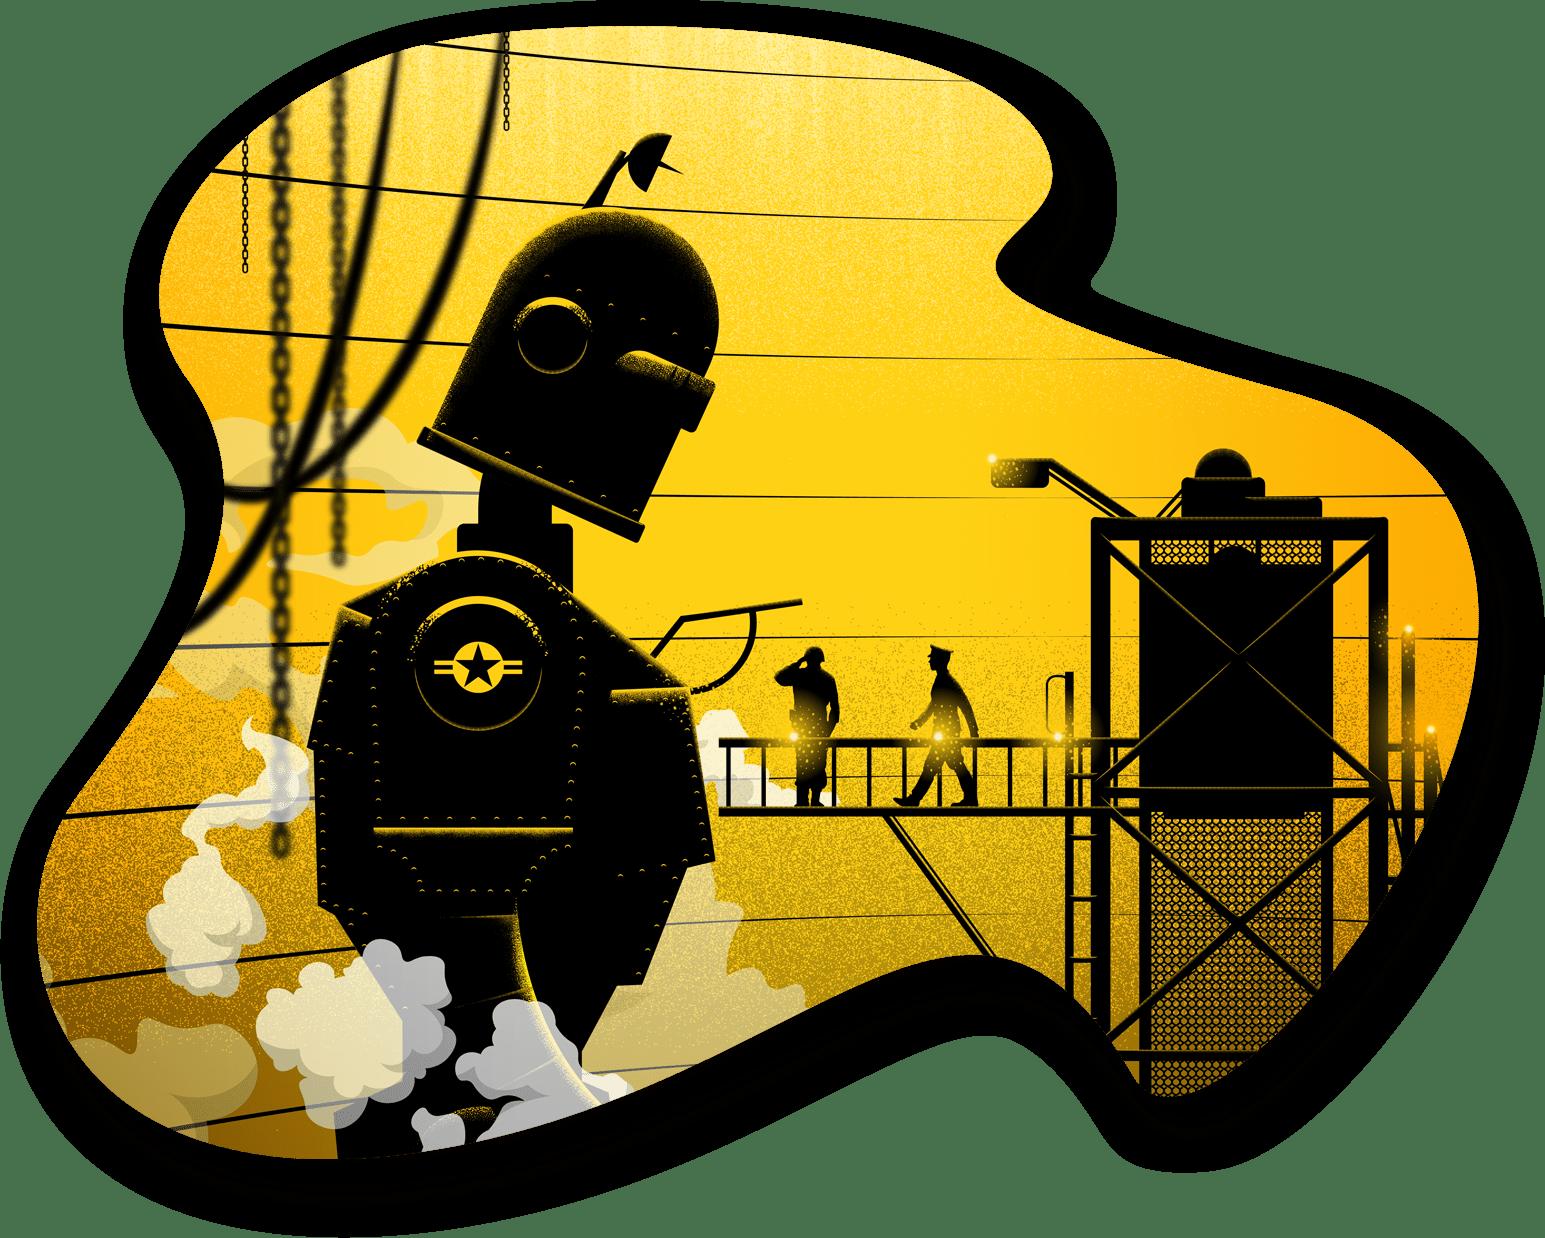 building a giant robot